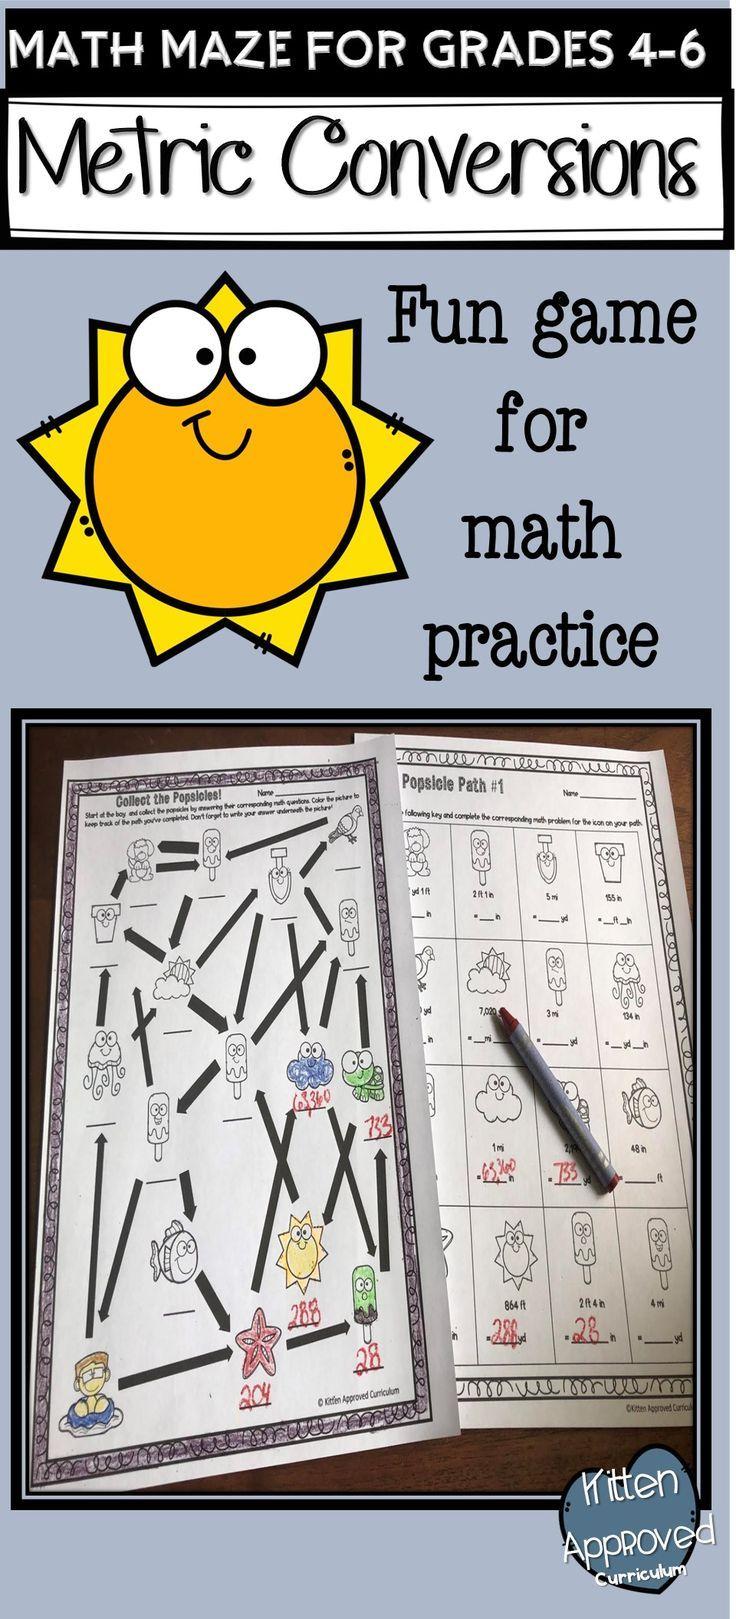 Metric Conversion Activities Customary Math Mazes 5th